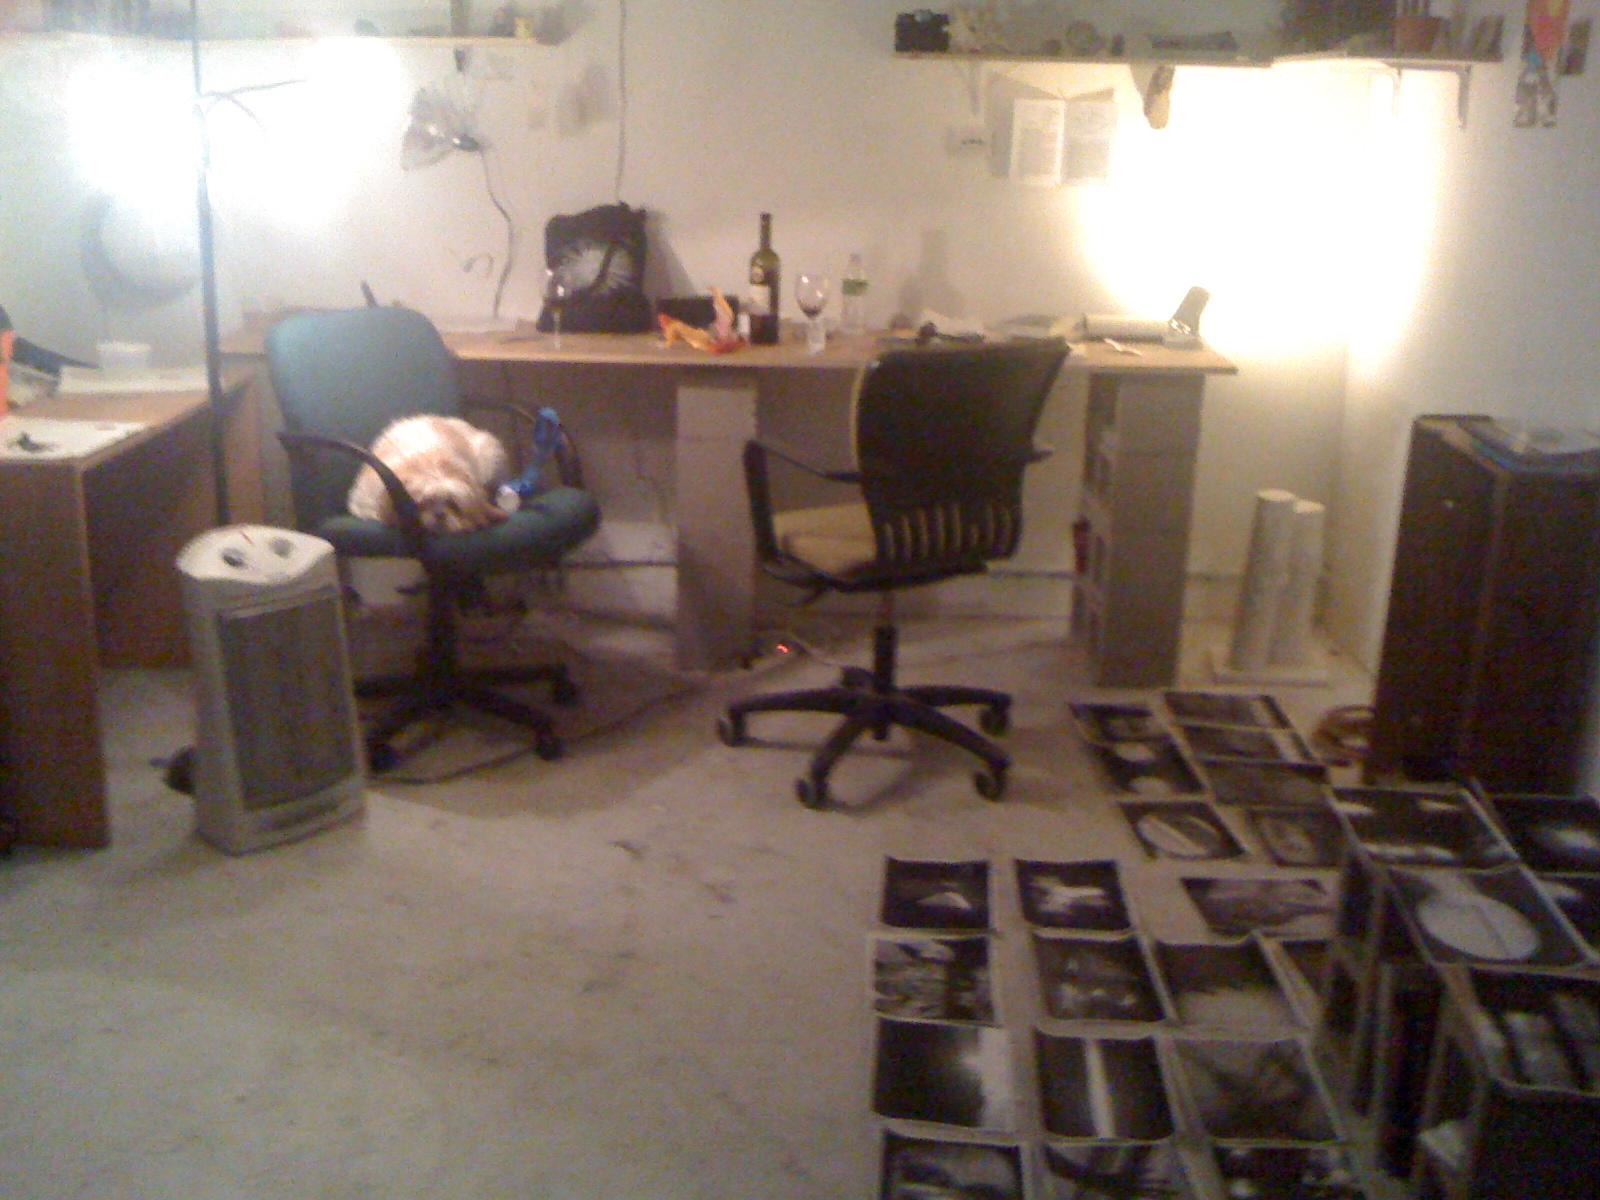 Studio times, Greenpoint, Brooklyn, March 6, 2010